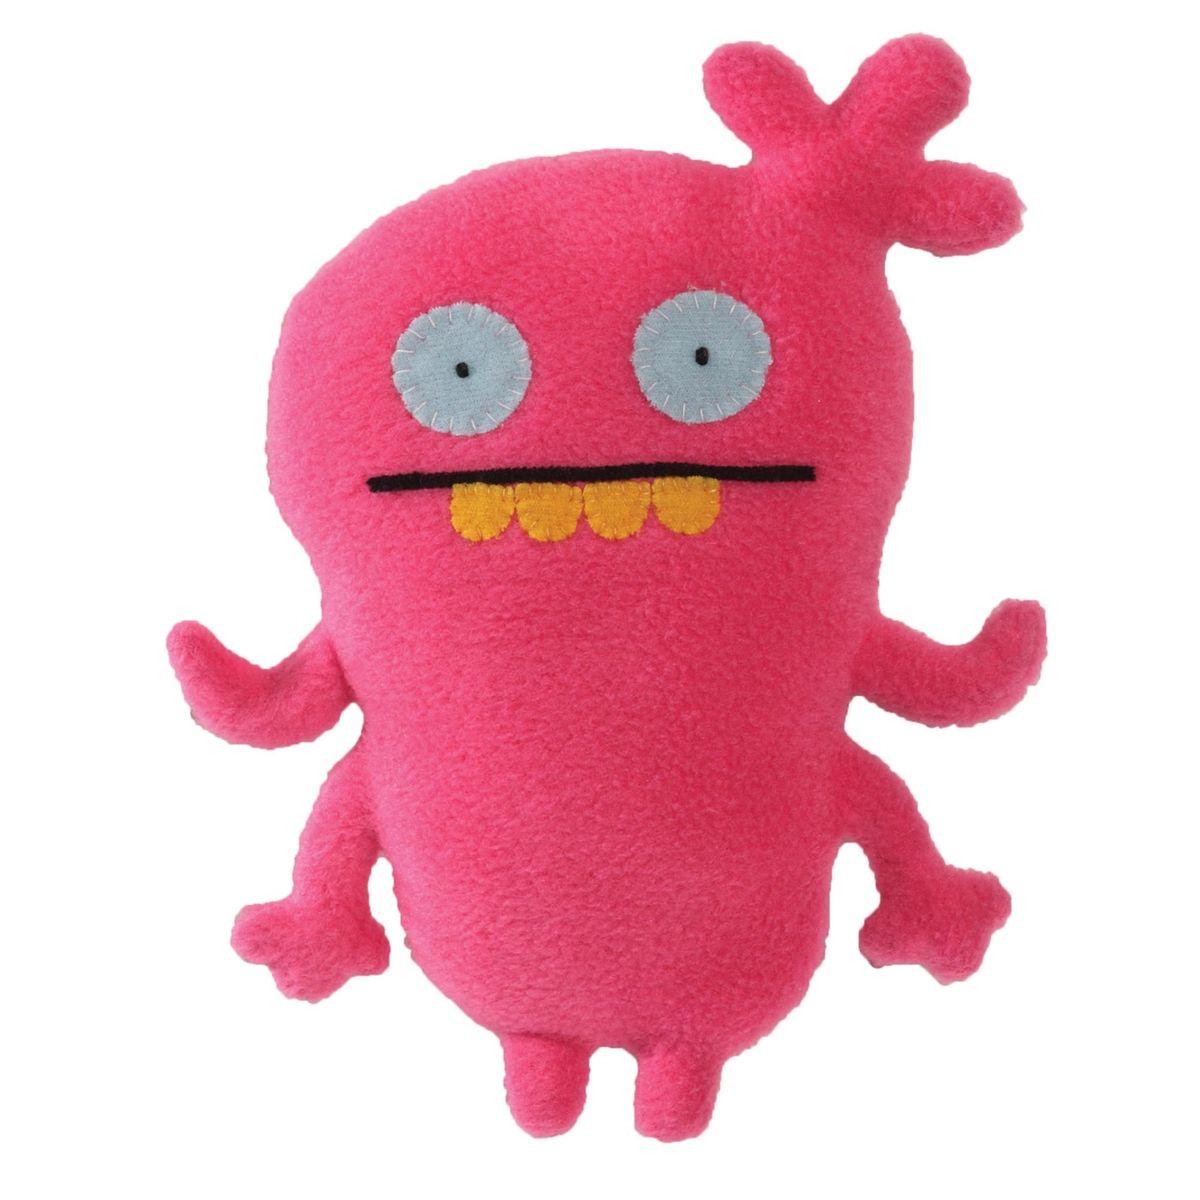 Мягкая игрушка Gorgeous, 17,5 см uglydoll мягкая игрушка gorgeous 35 см